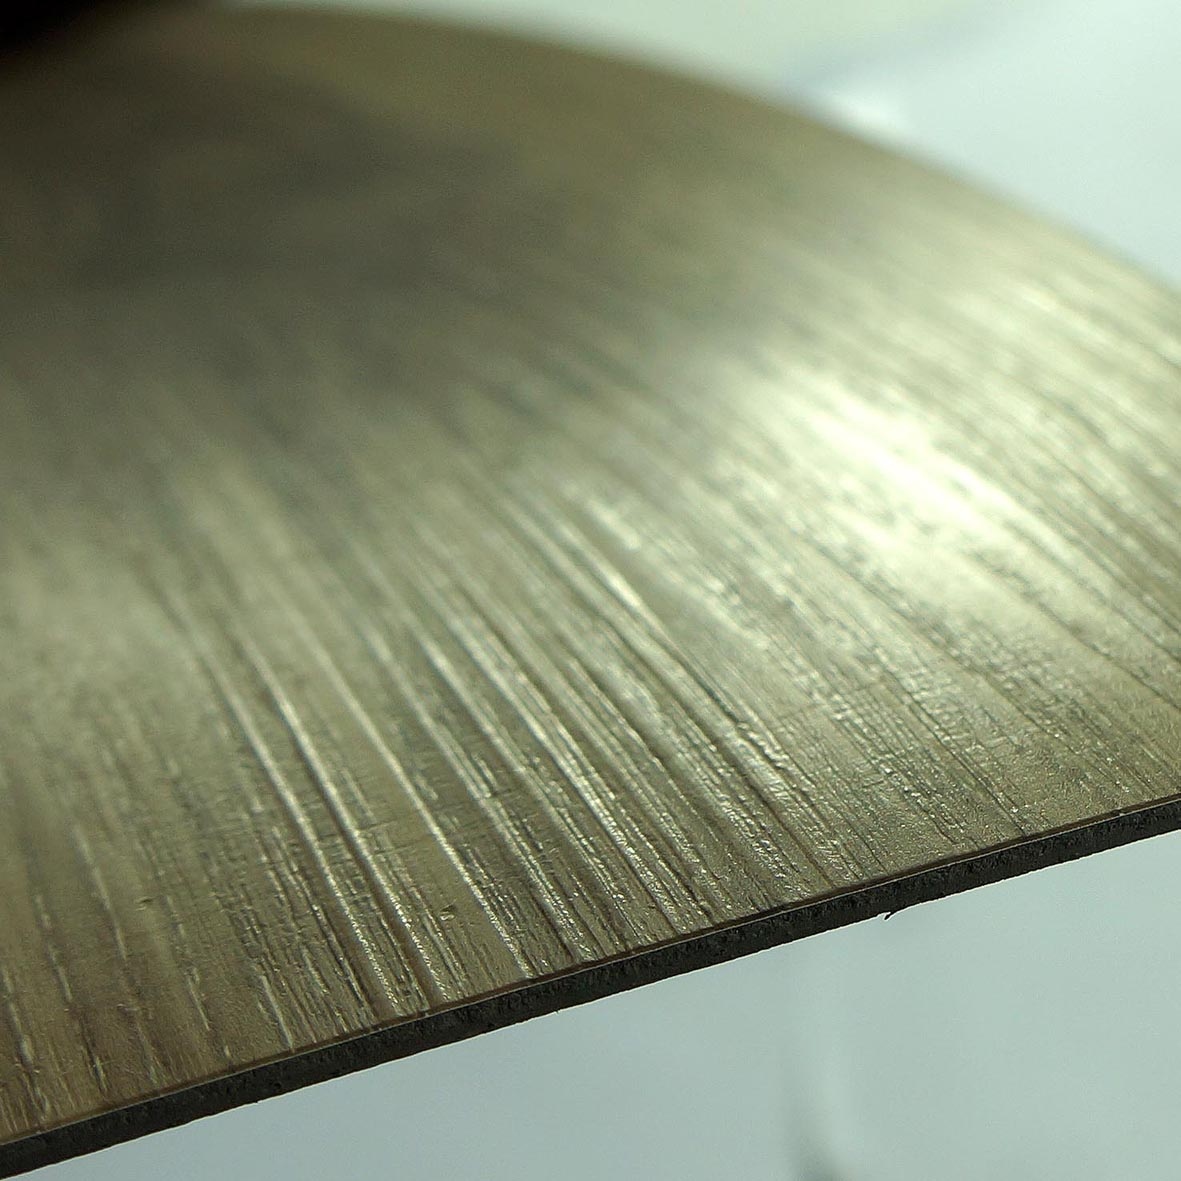 Fireproof Best Glue Down Vinyl Plank Flooring Topjoyflooring